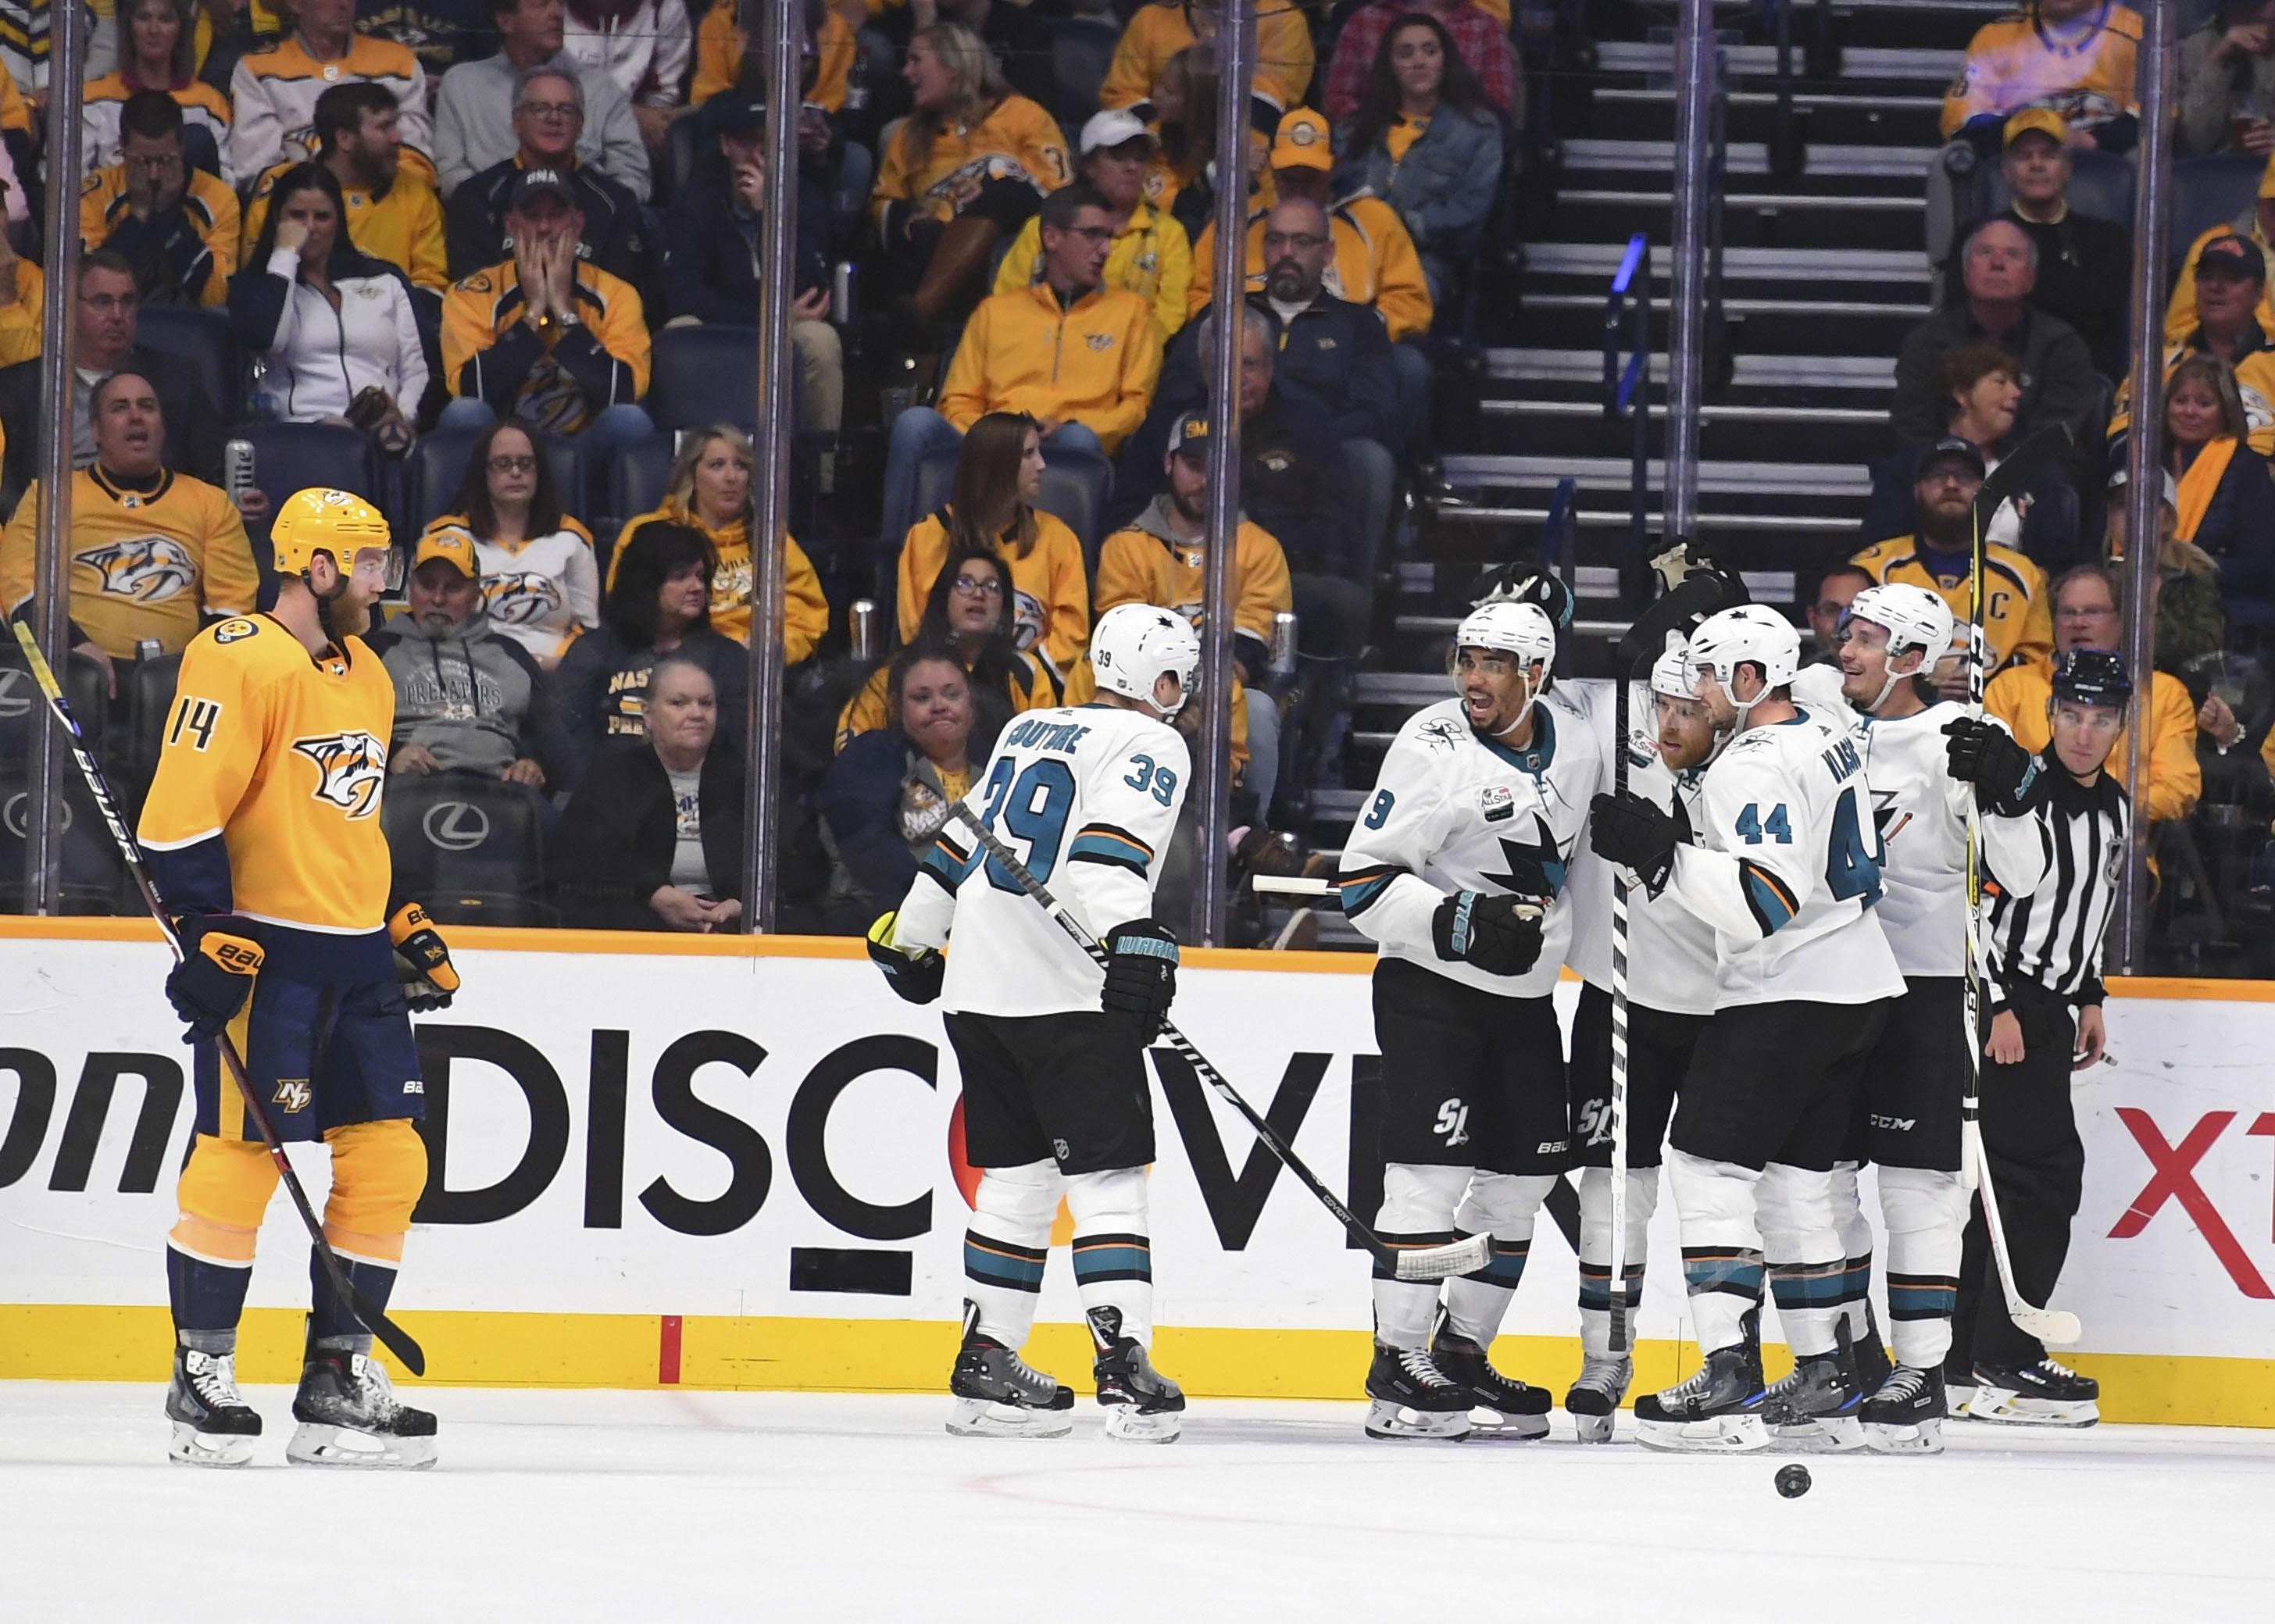 Oct 23, 2018; Nashville, TN, USA; San Jose Sharks players celebrate after a goal by center Joe Pavelski (8) during the third period against the Nashville Predators at Bridgestone Arena.